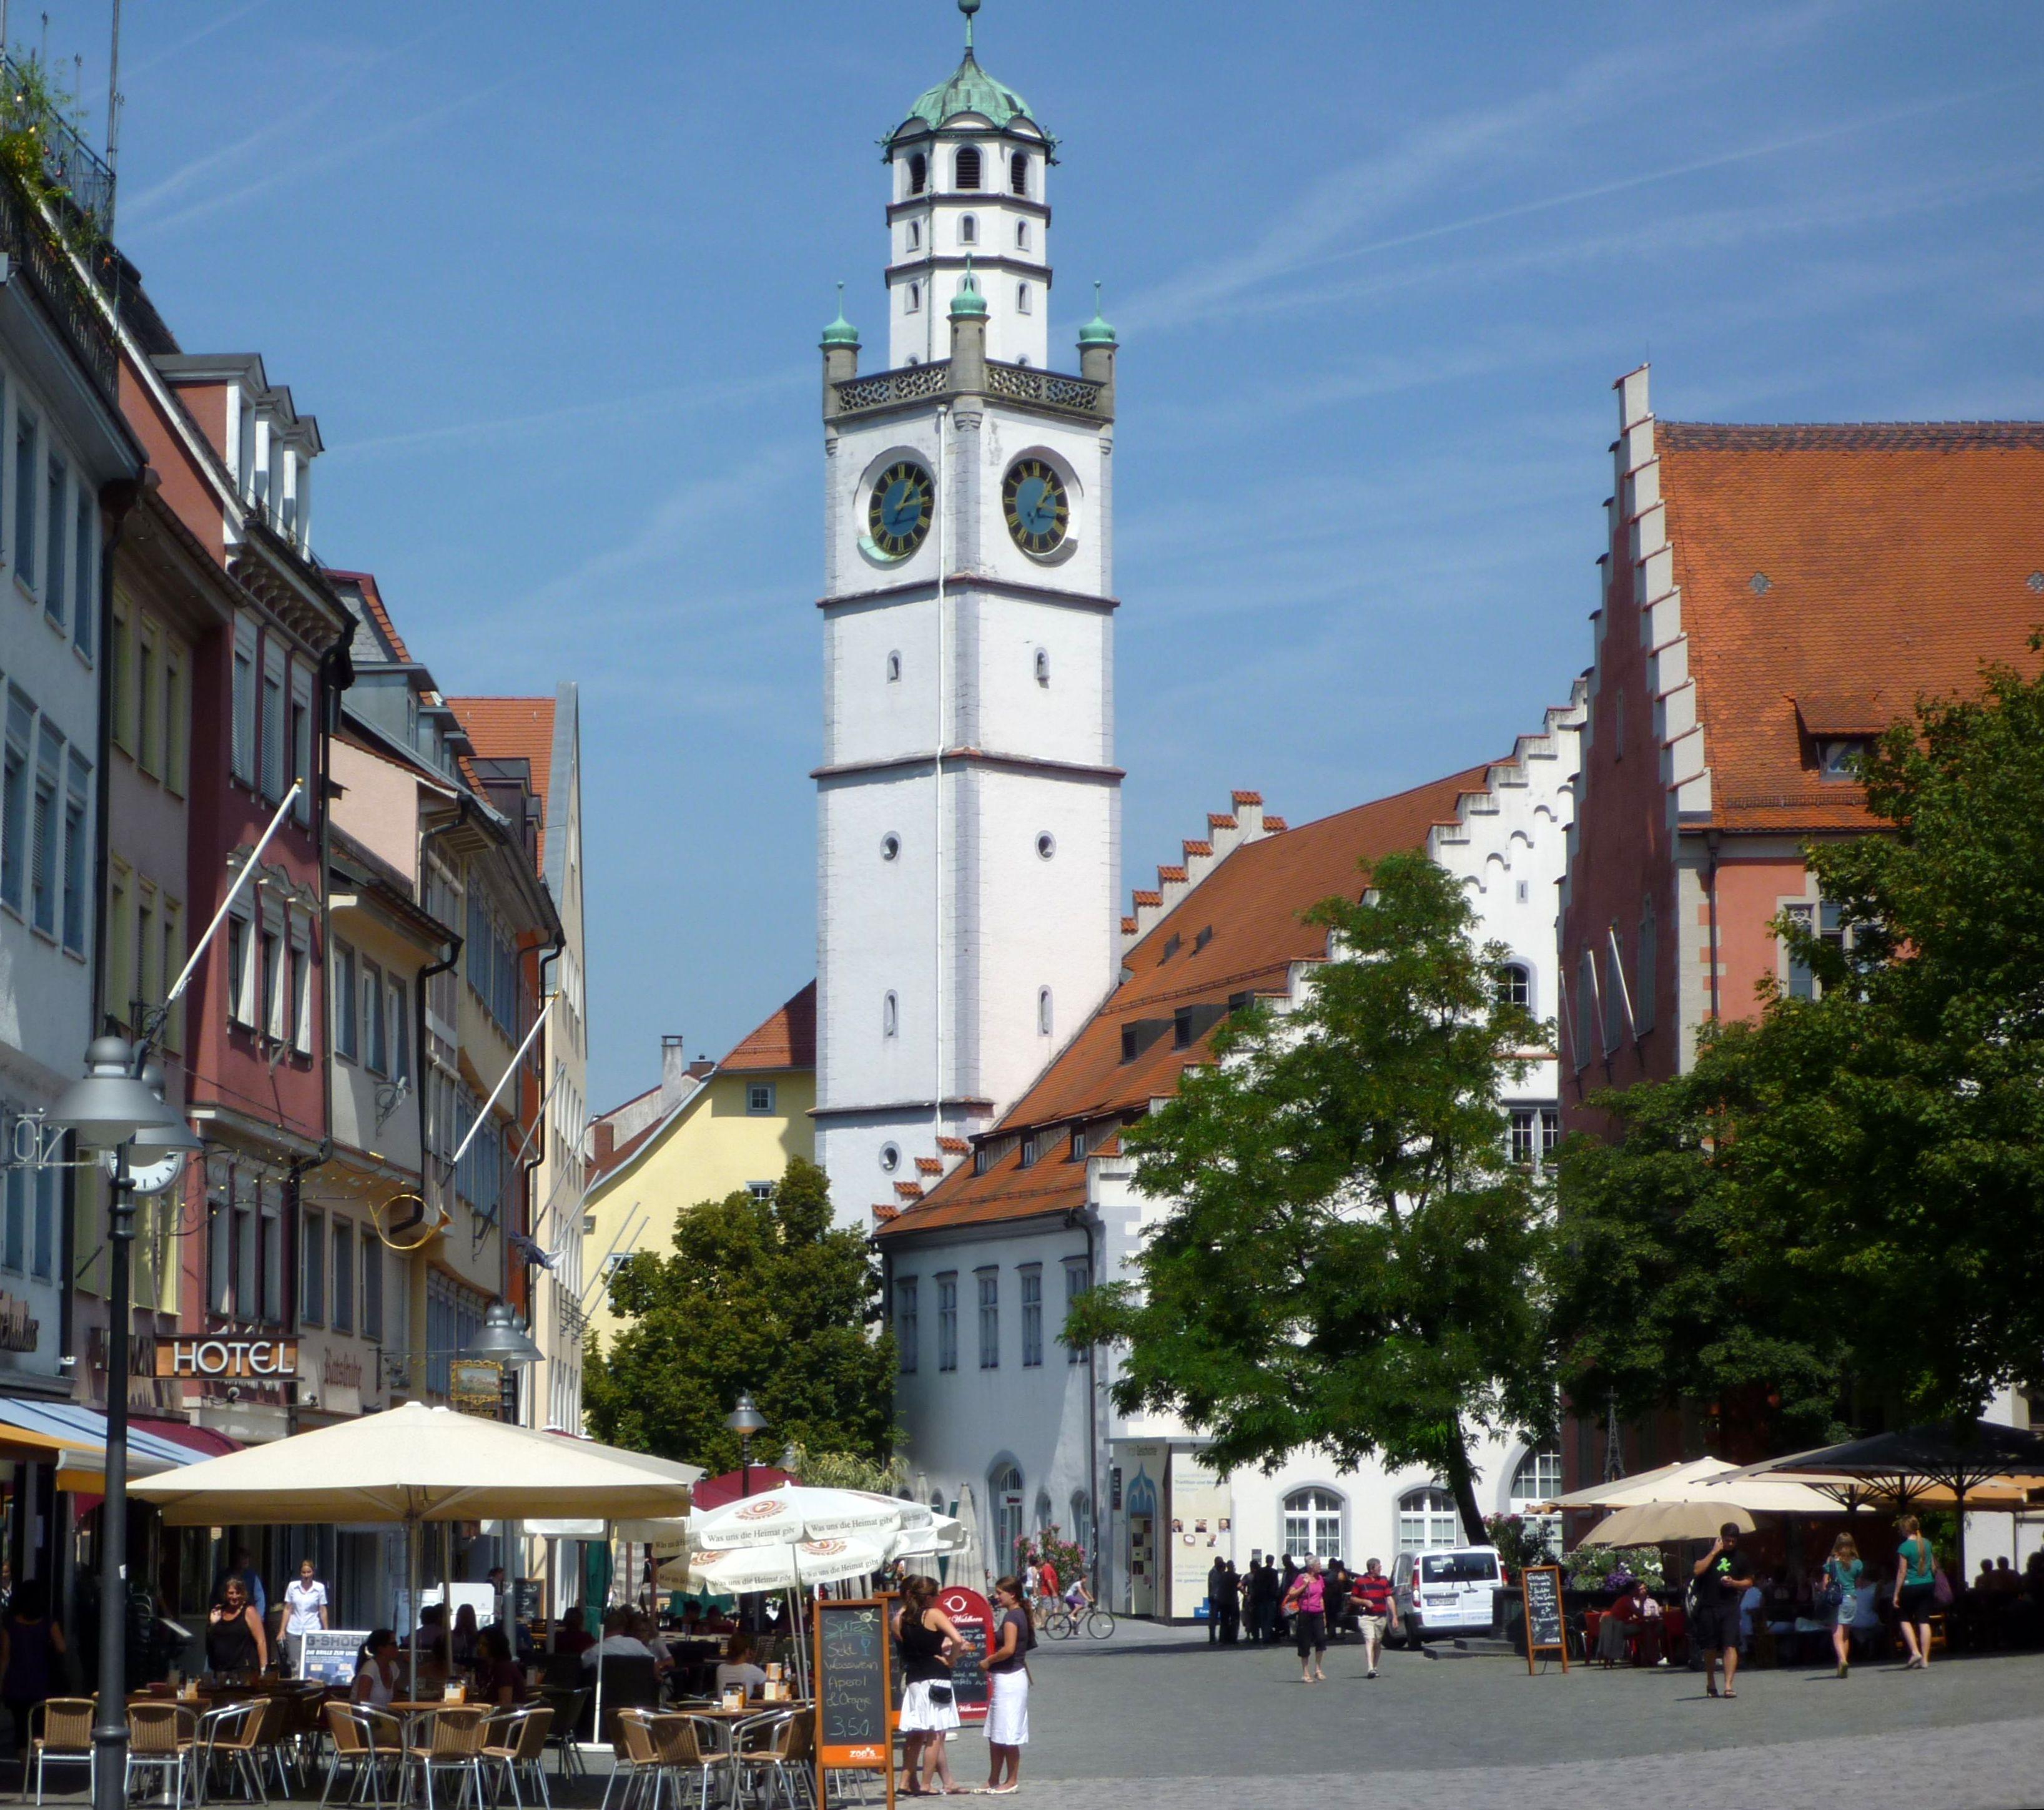 Ravensburg dating